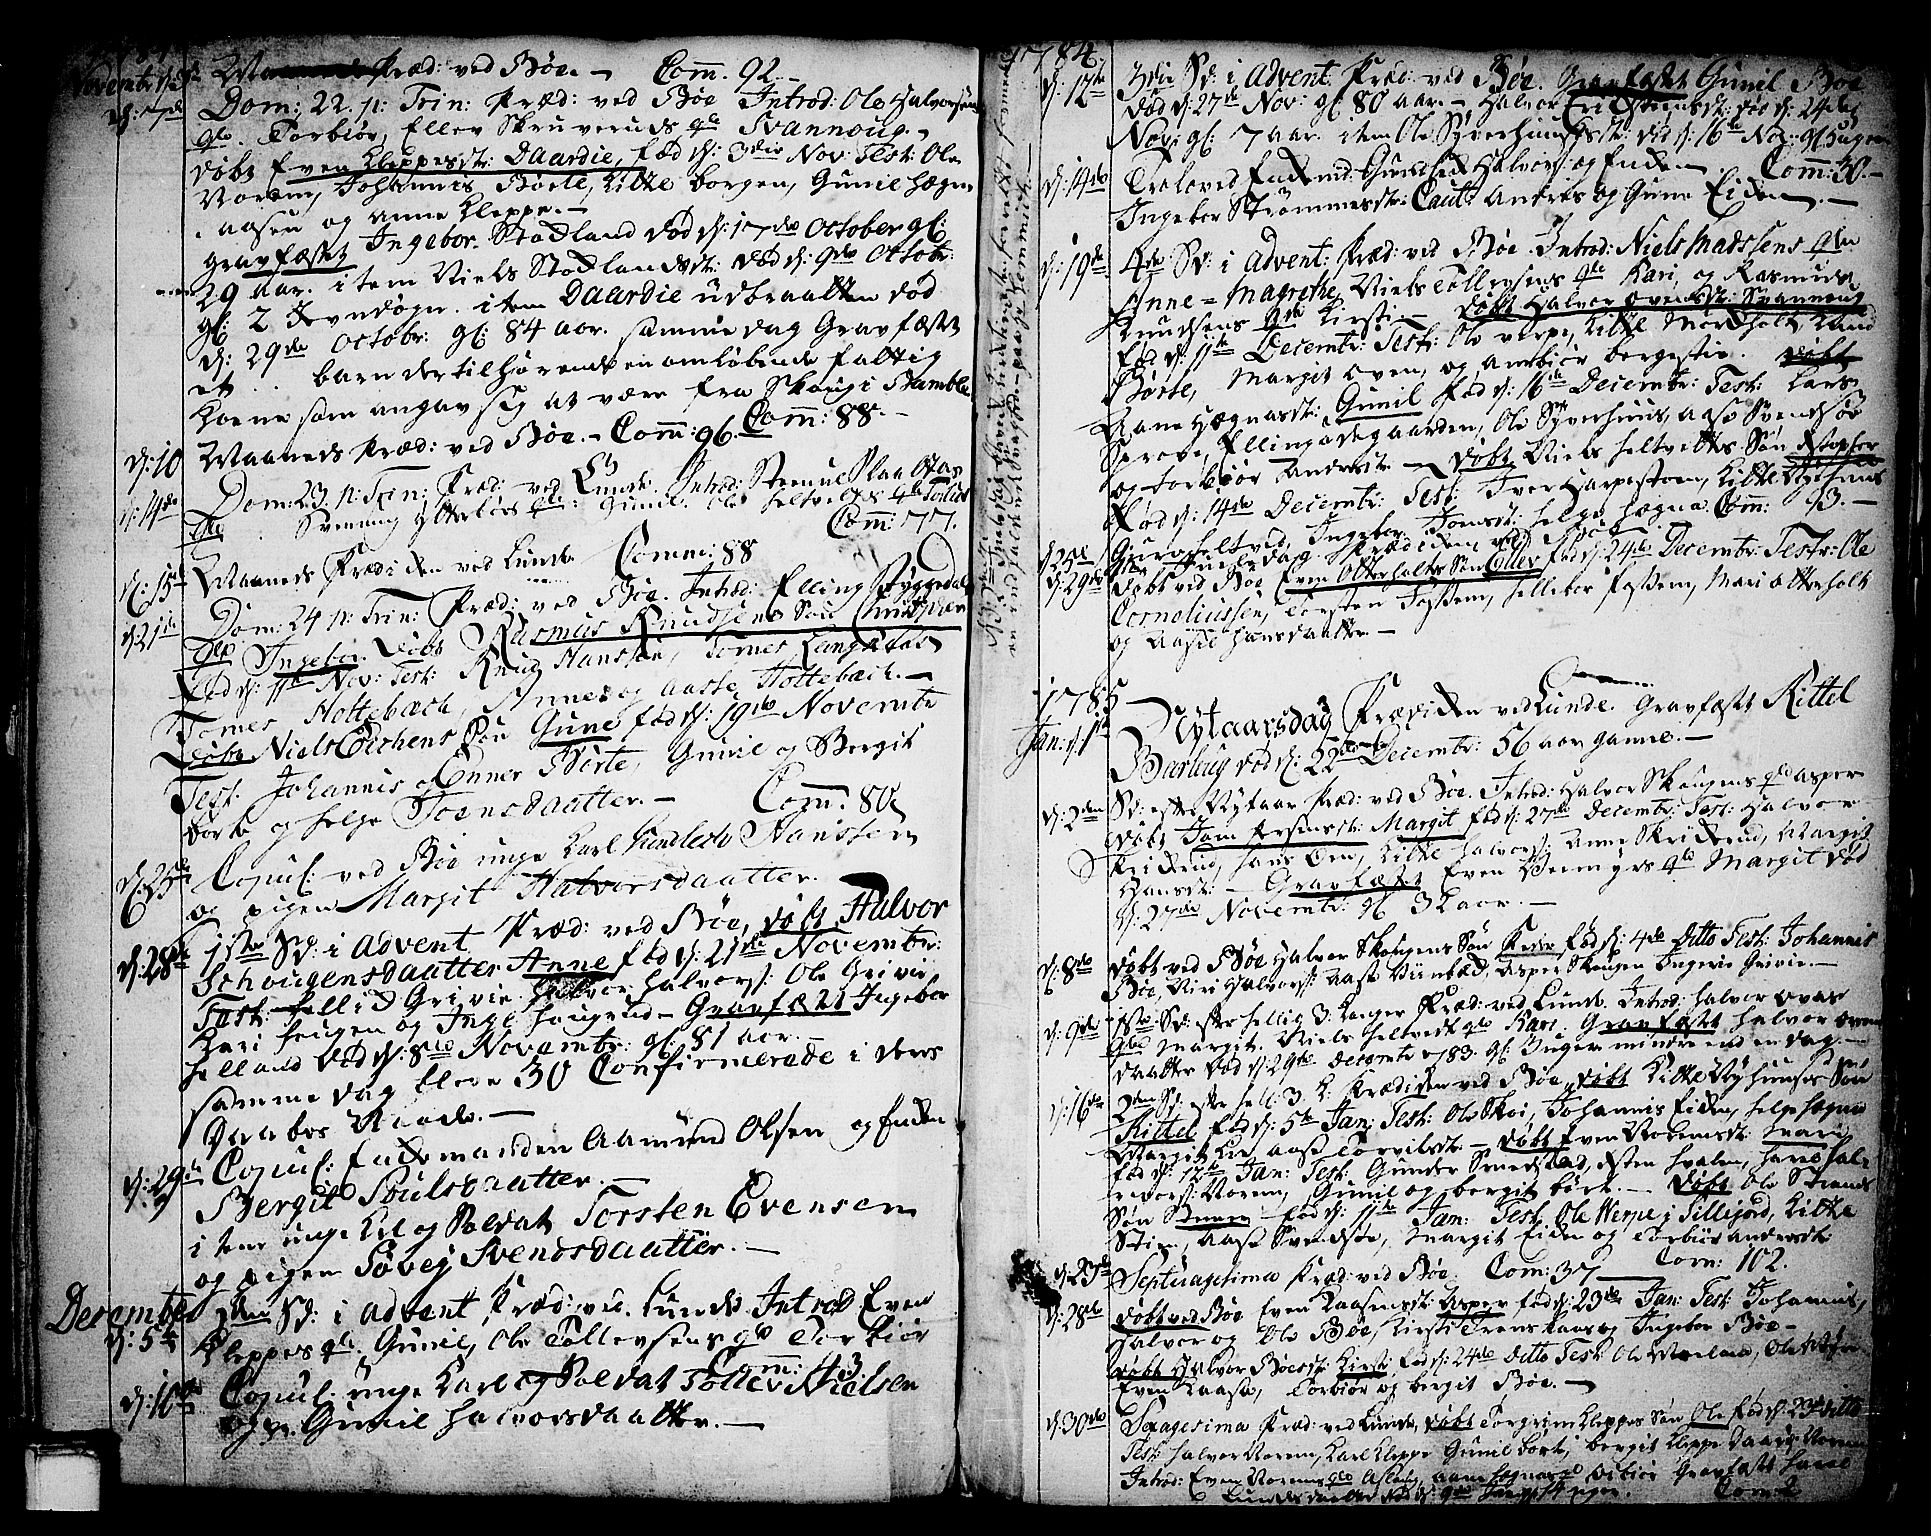 SAKO, Bø kirkebøker, F/Fa/L0004: Parish register (official) no. 4, 1748-1785